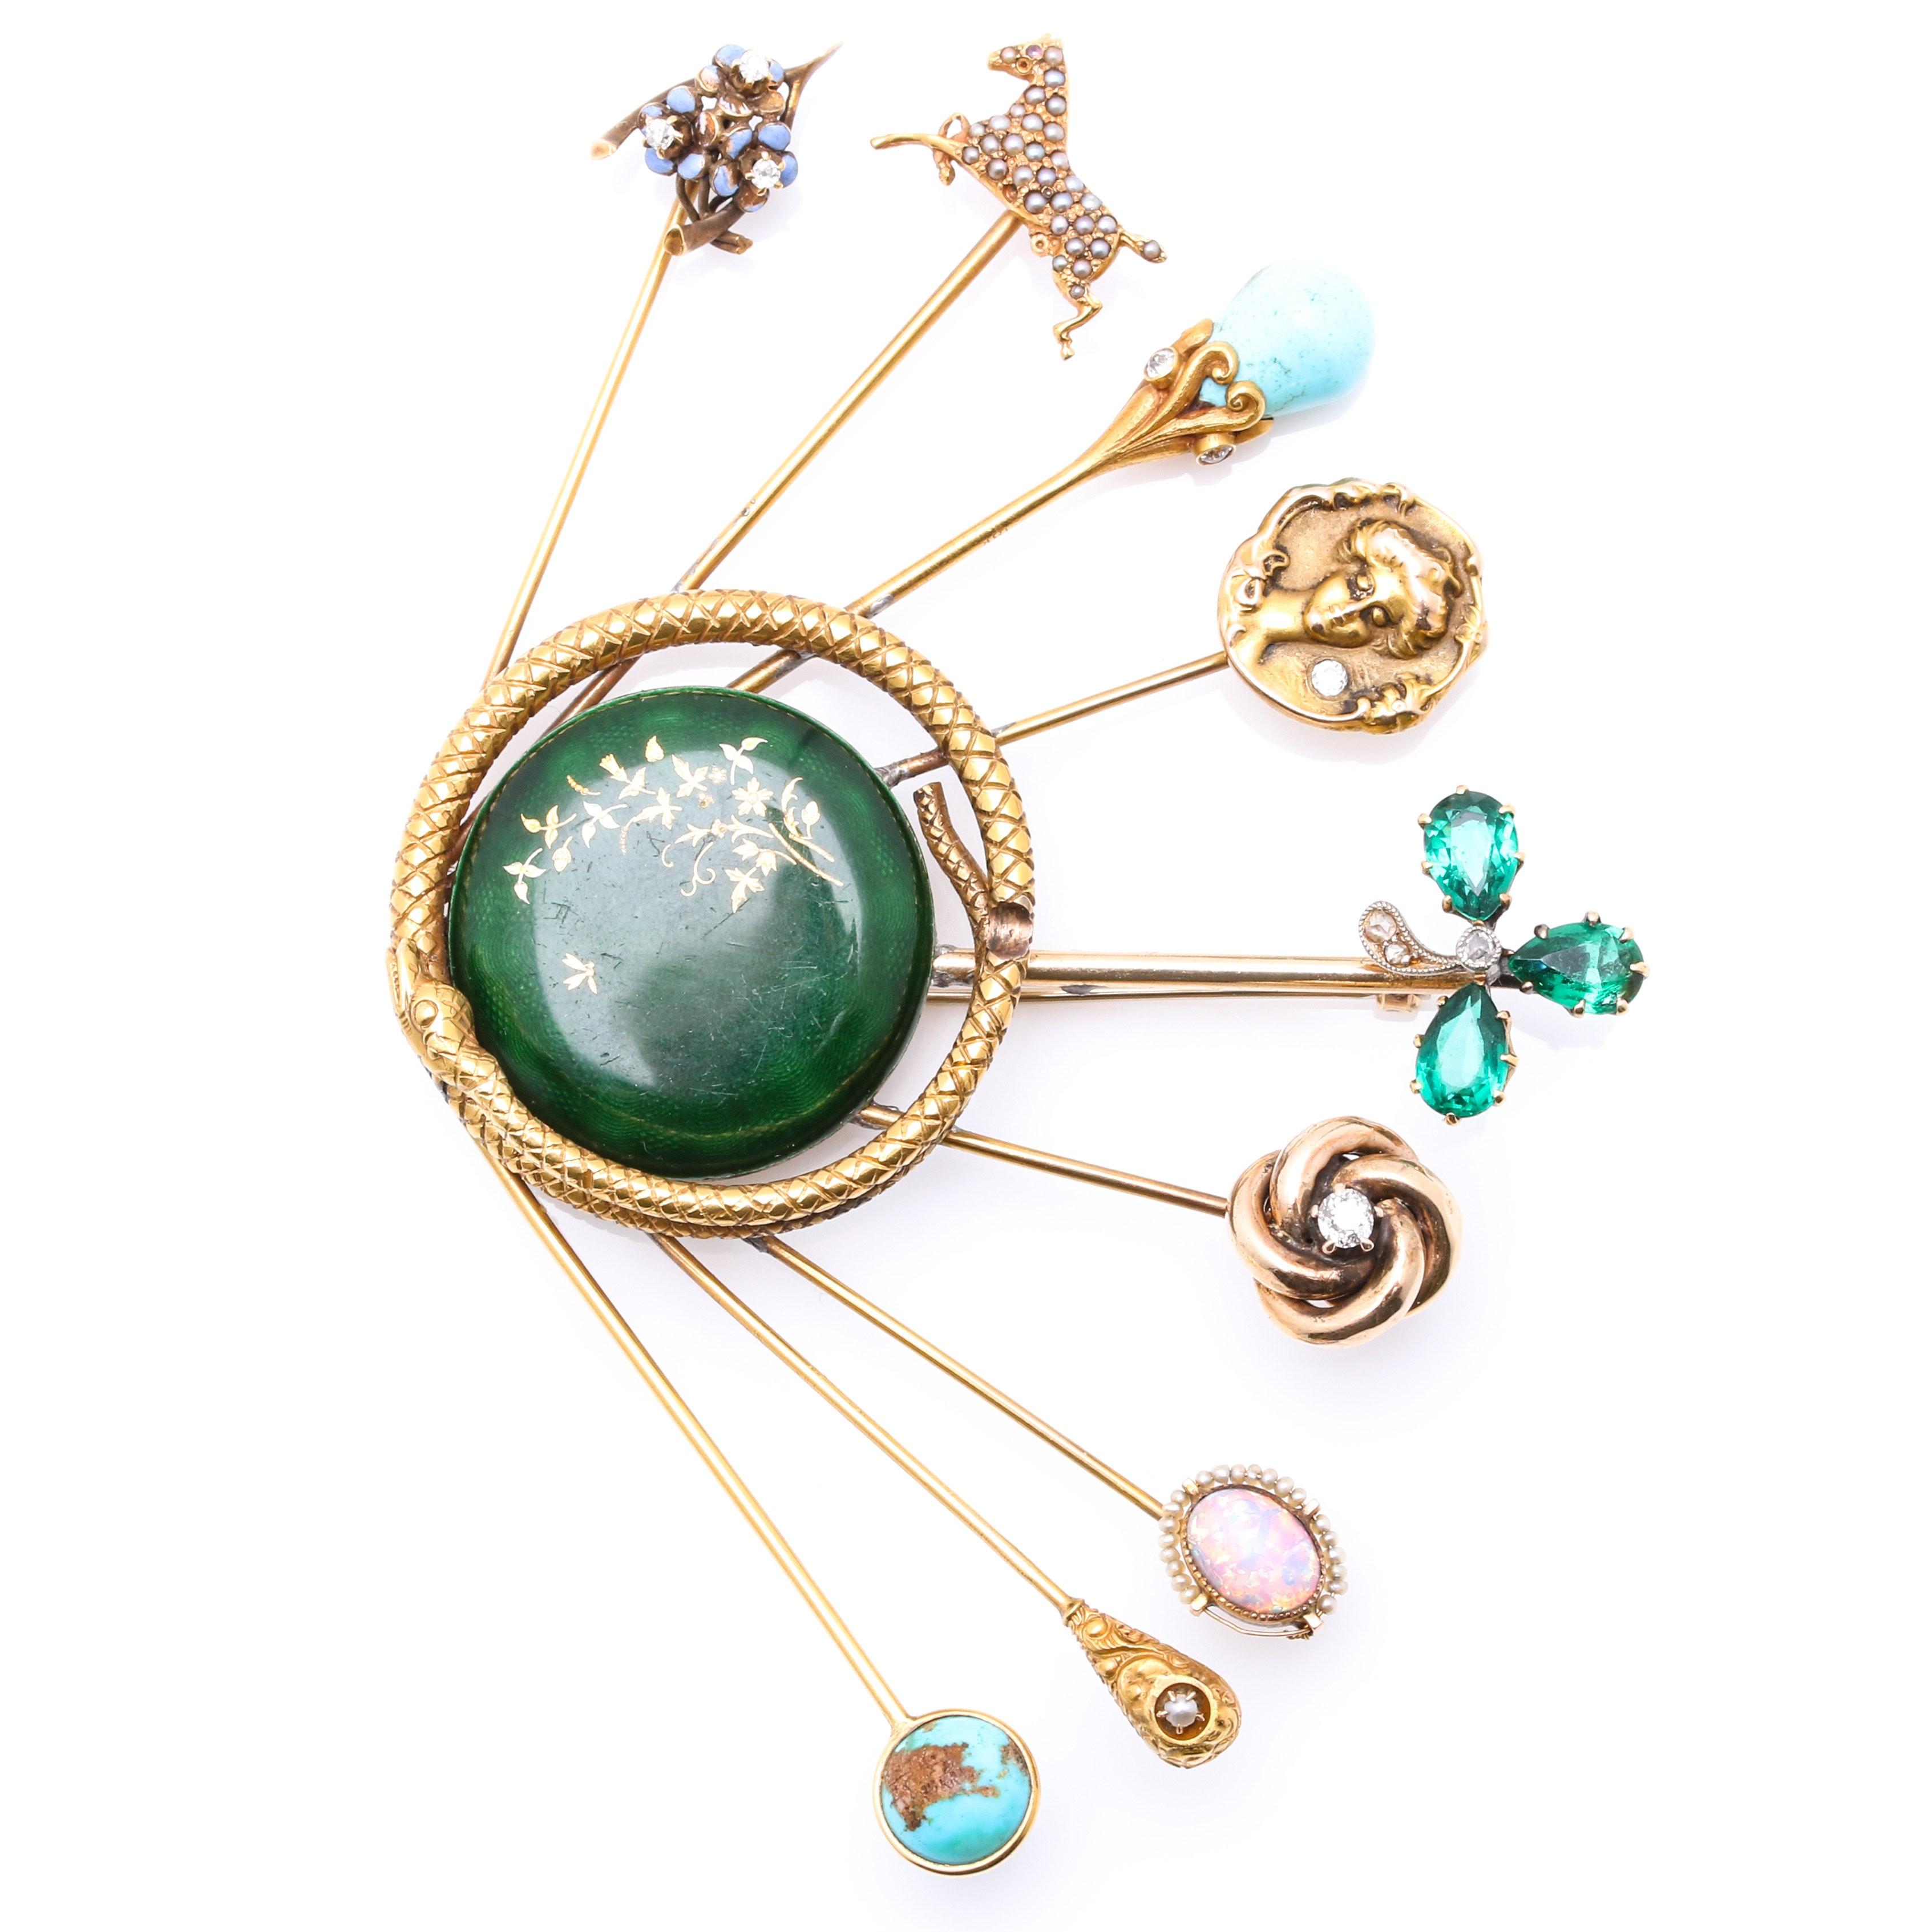 Mixed Gold Custom Stick Pin Brooch